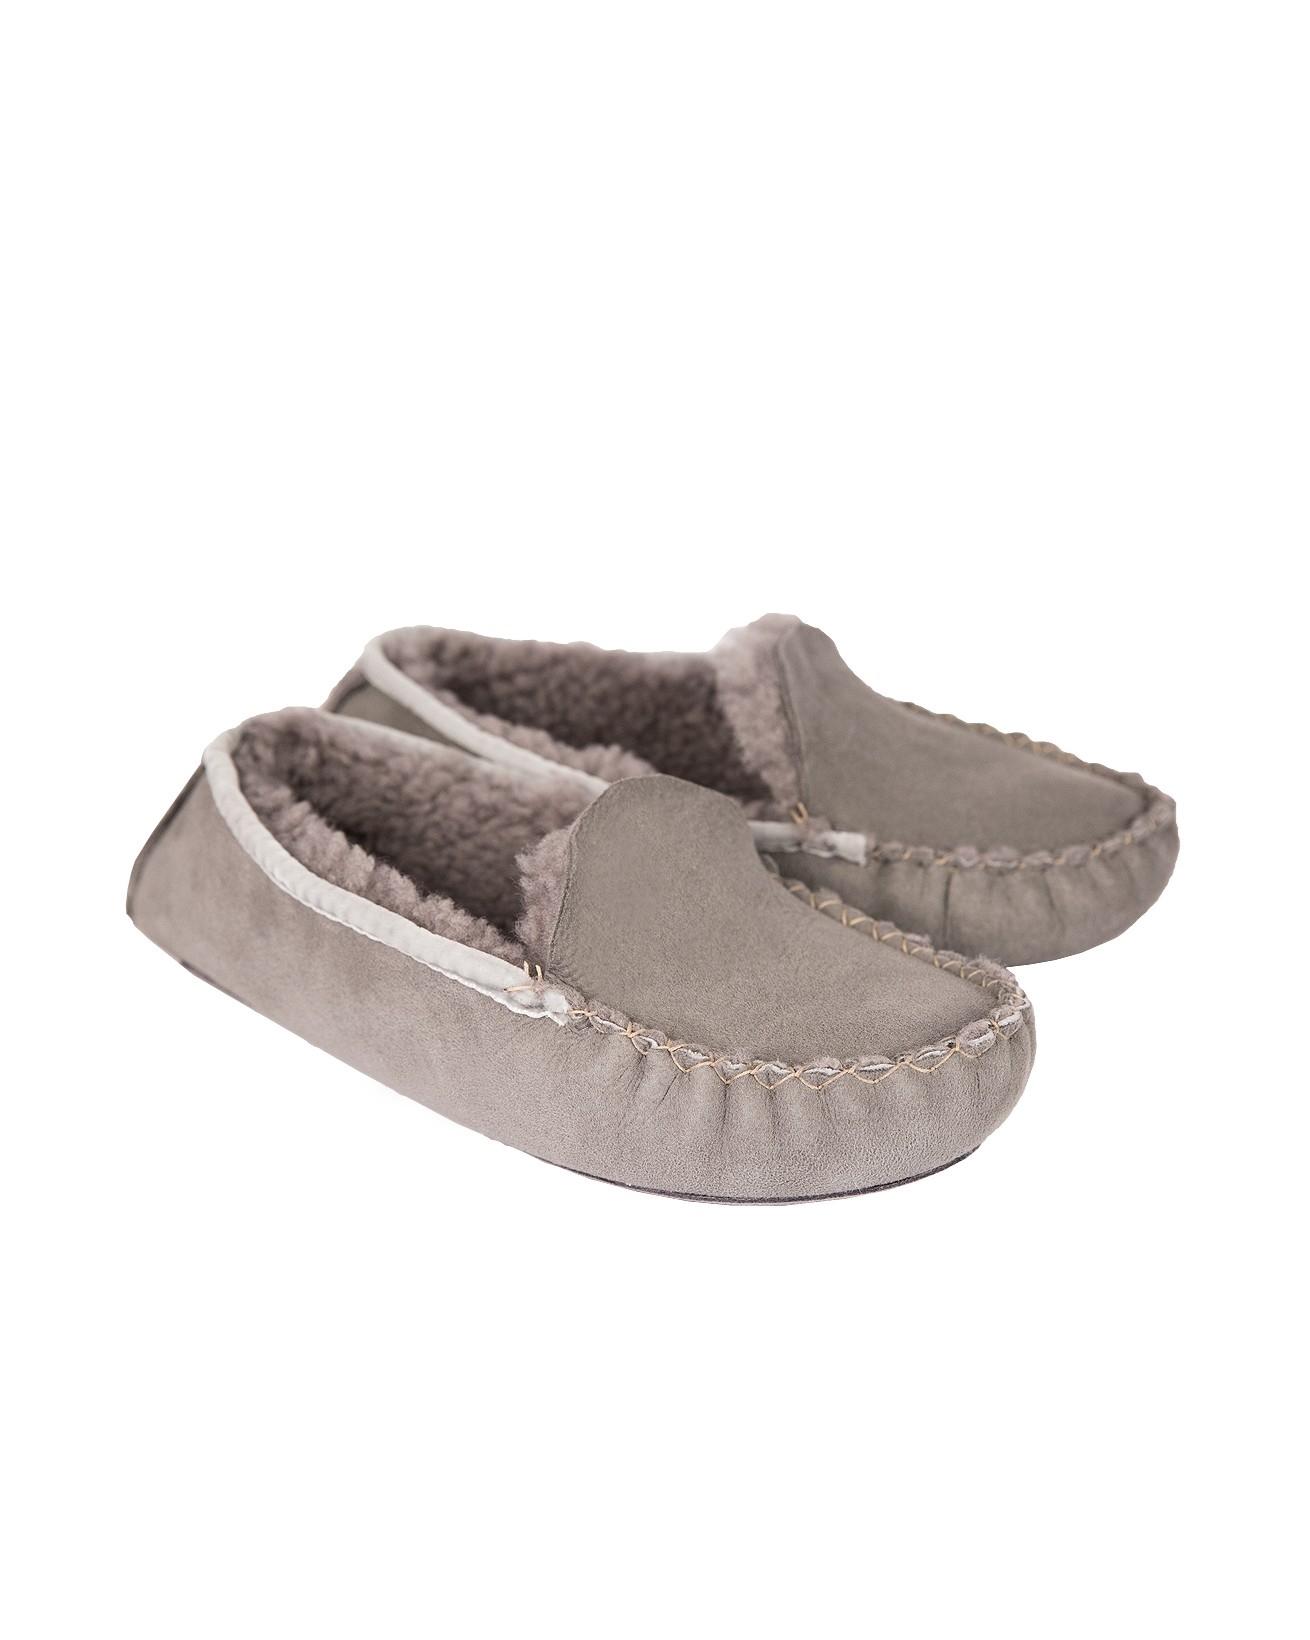 Dena Moccasins - Size 4 - Grey - 797